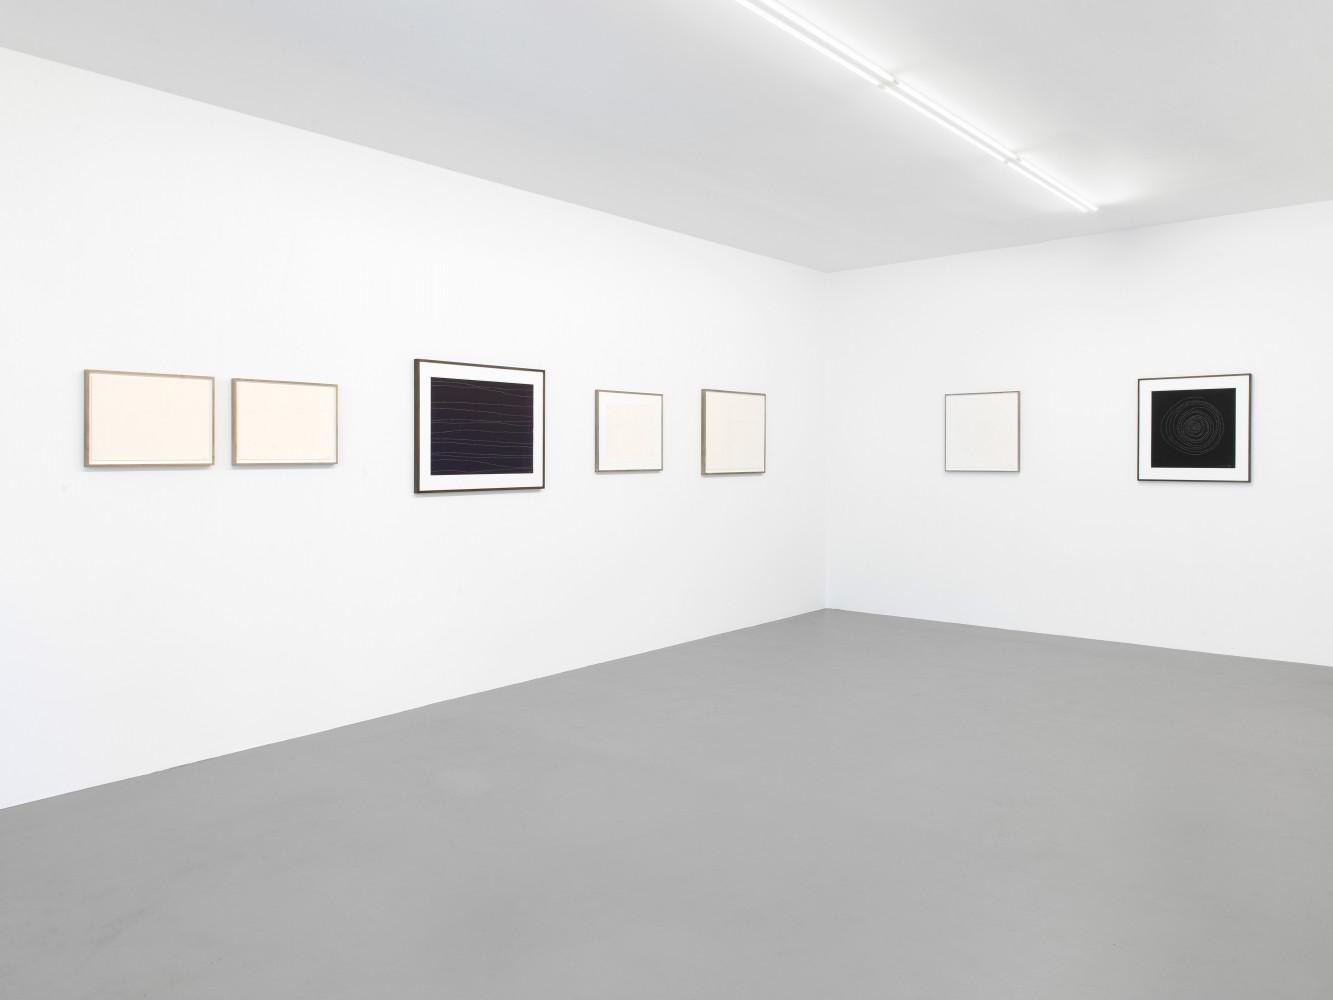 Tatsuo Miyajima, 'Drawings', Installation view, Buchmann Box, 2018